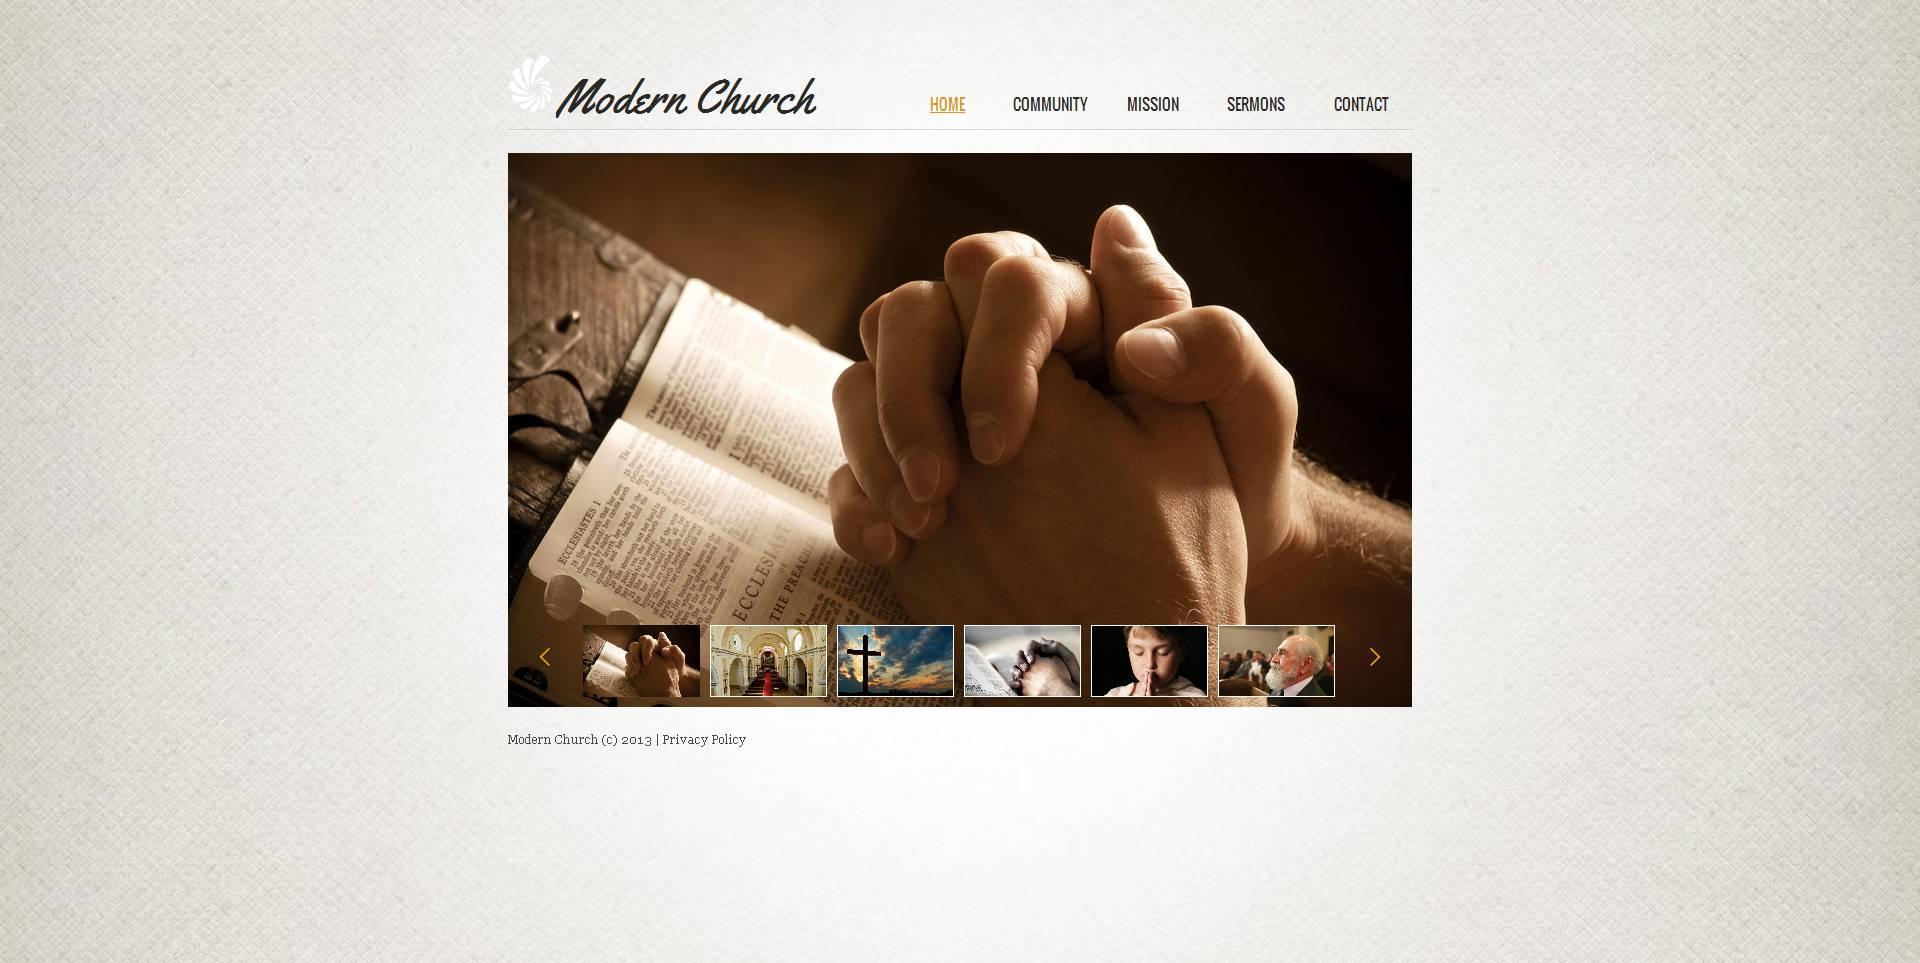 Premium Moto CMS HTML Template over Christelijke №47200